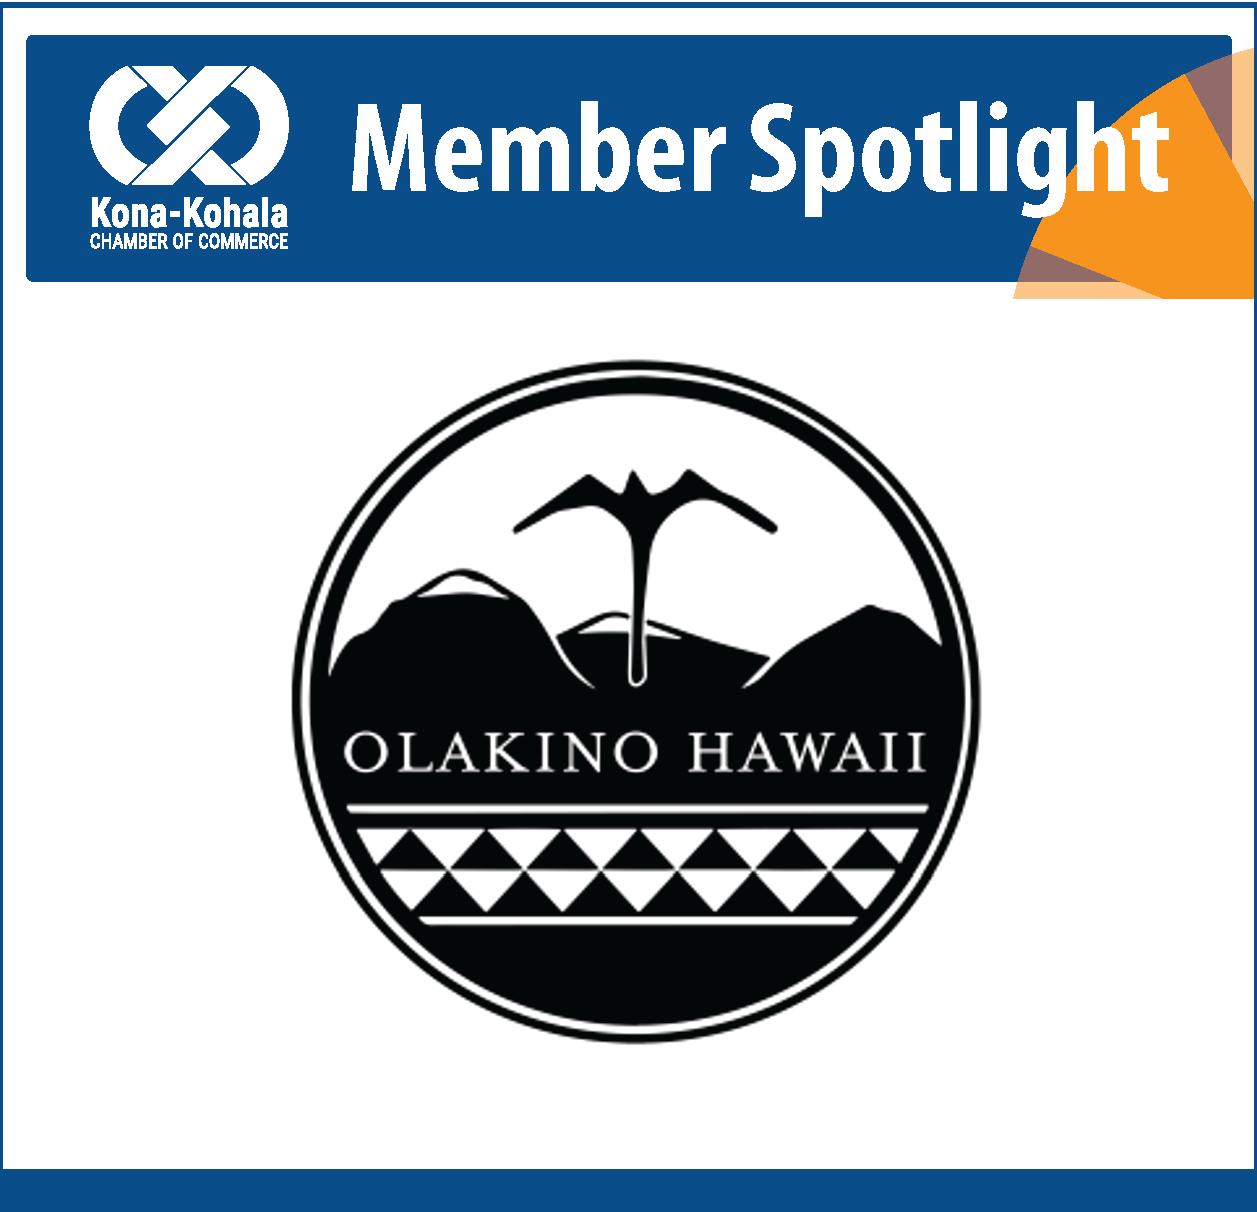 Olakino Hawai'i Celebrates 1st Anniversary